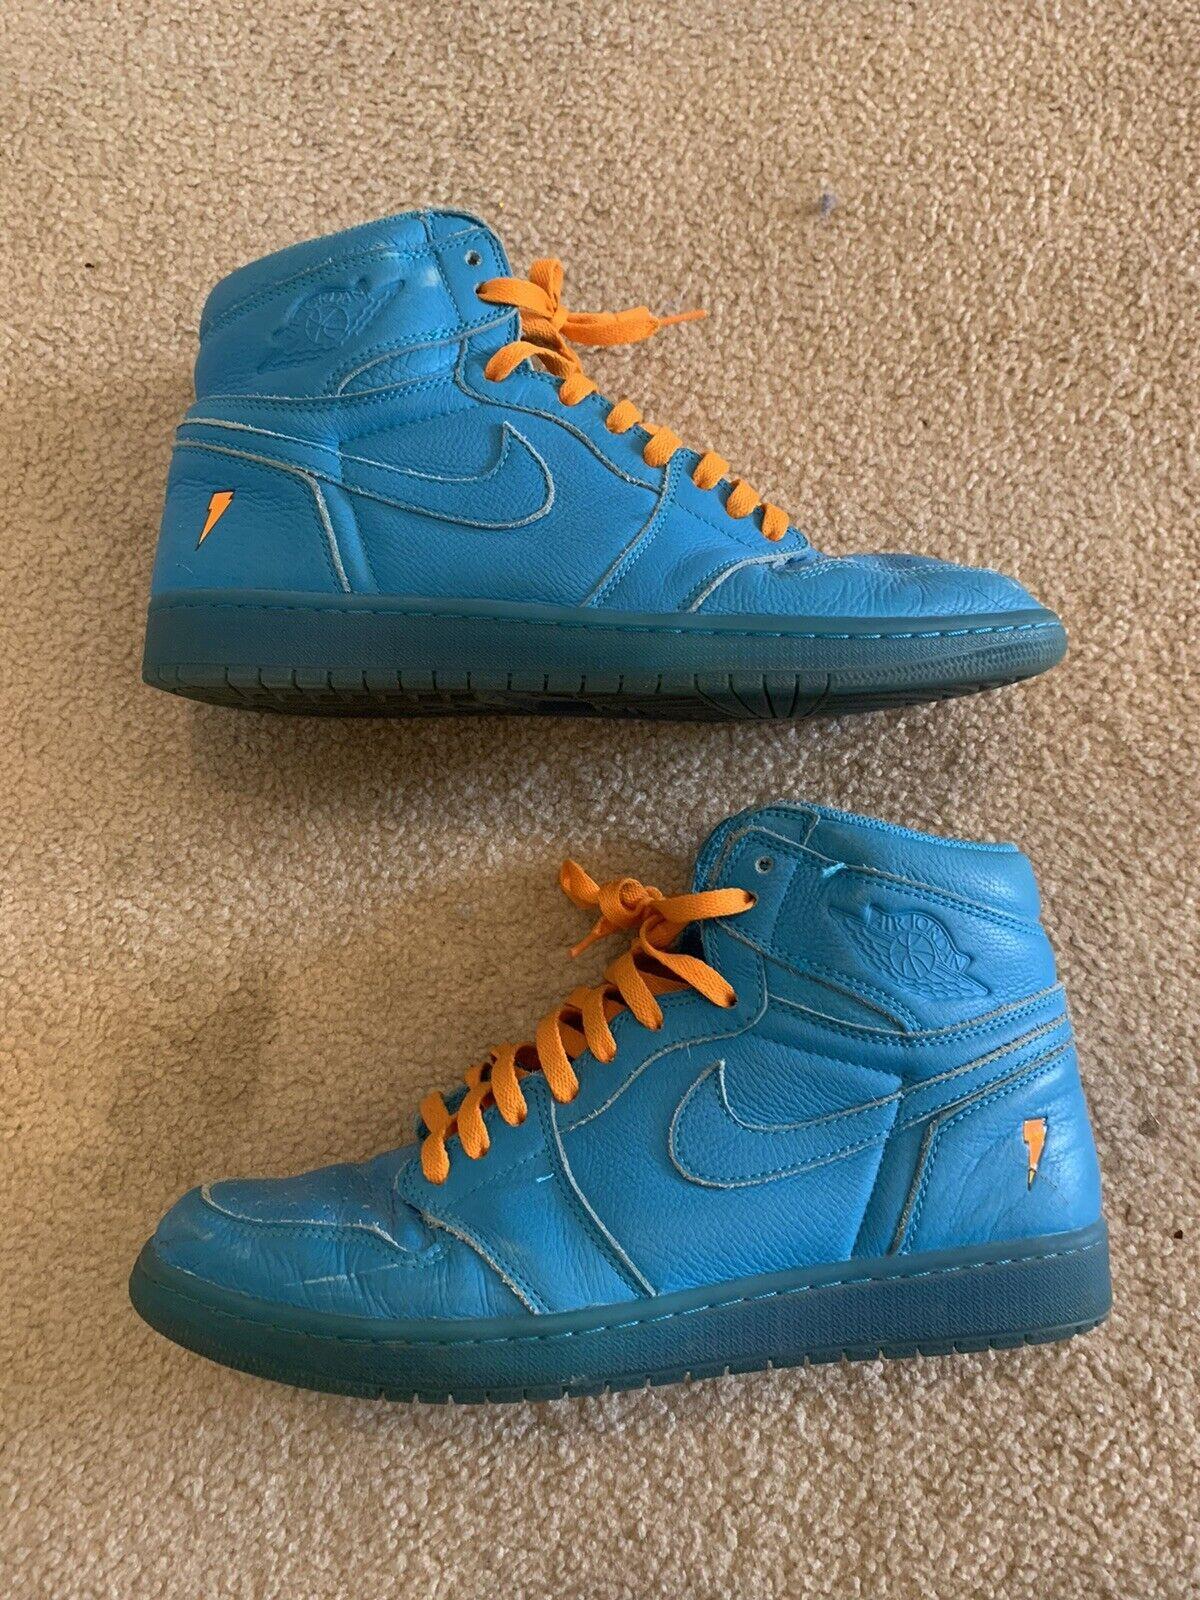 Jordan 1 Retro High OG Gatorade Blue Lagoon Size 11